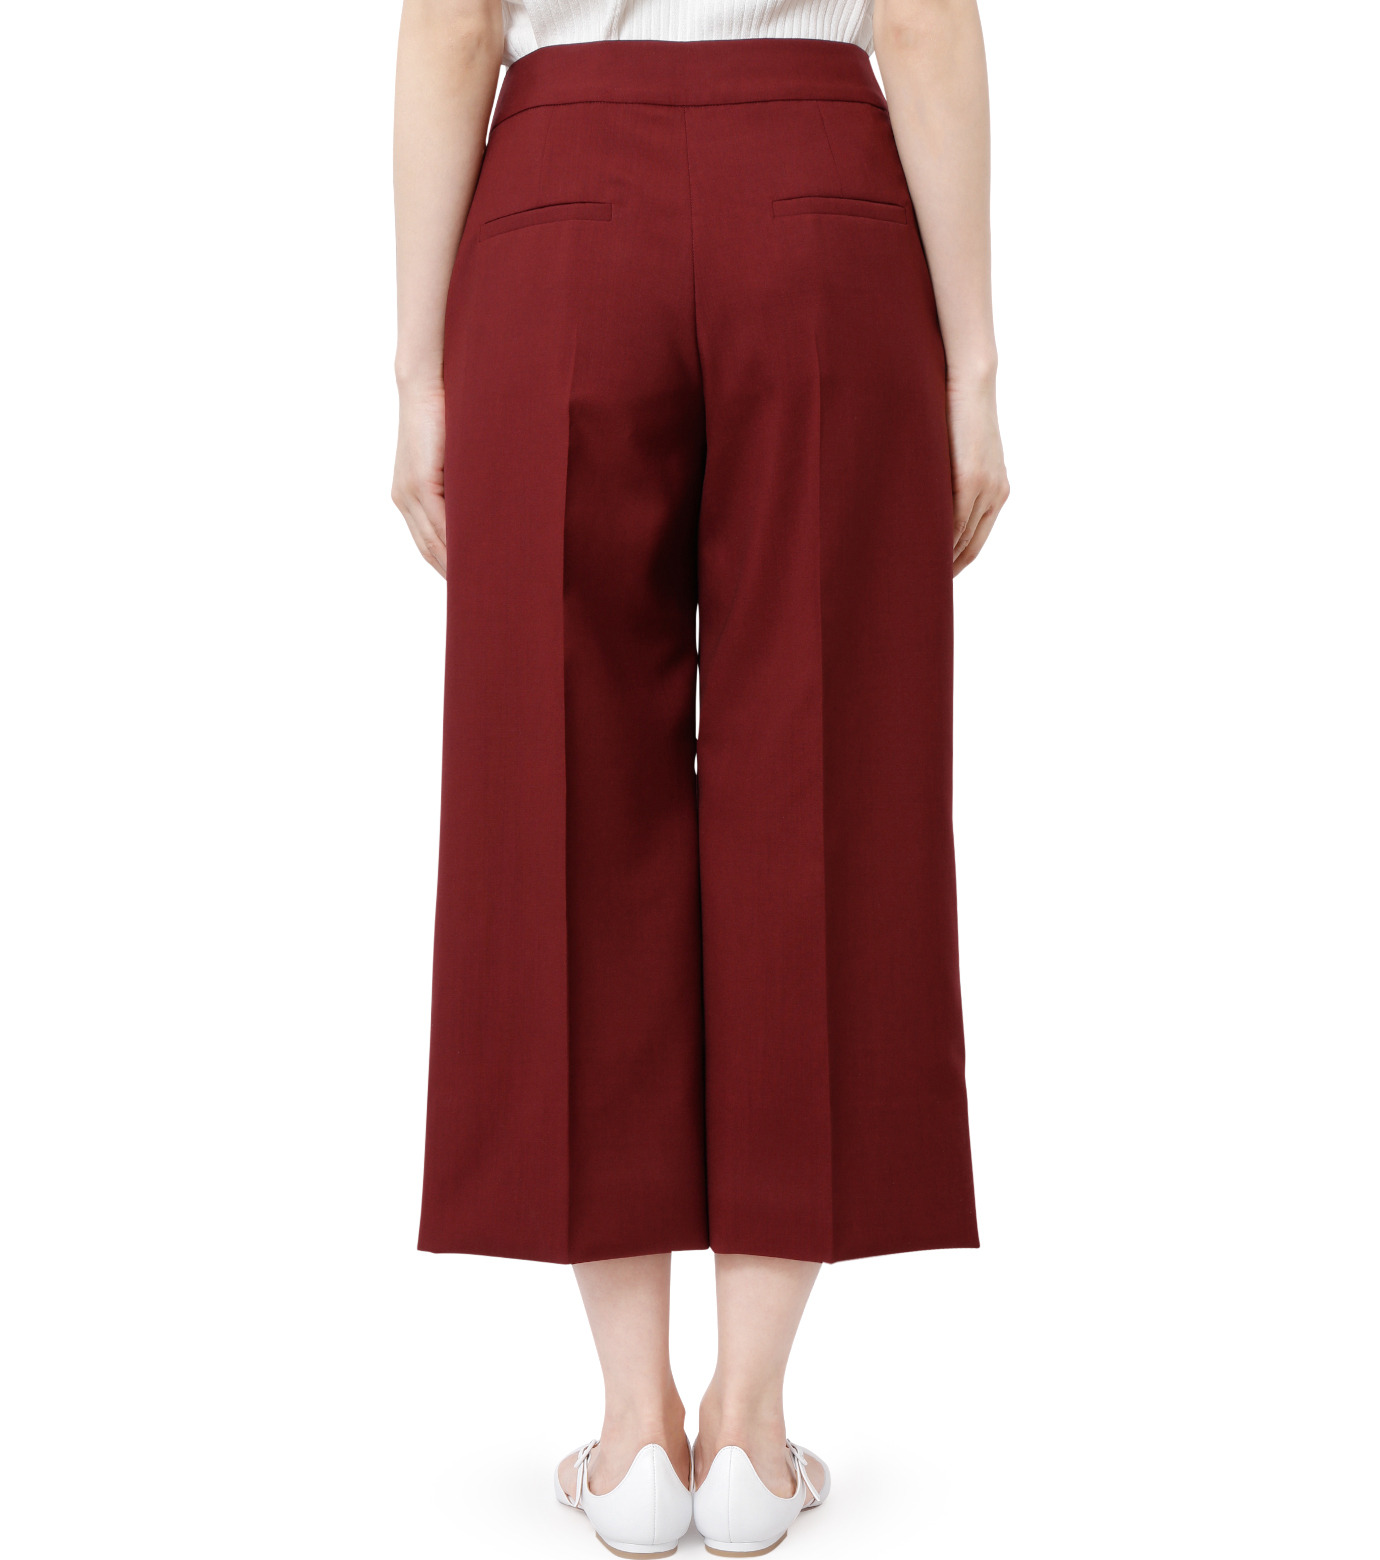 LE CIEL BLEU(ルシェルブルー)のサマーウールストレートパンツ-BORDEAUX(パンツ/pants)-18A68001 拡大詳細画像3